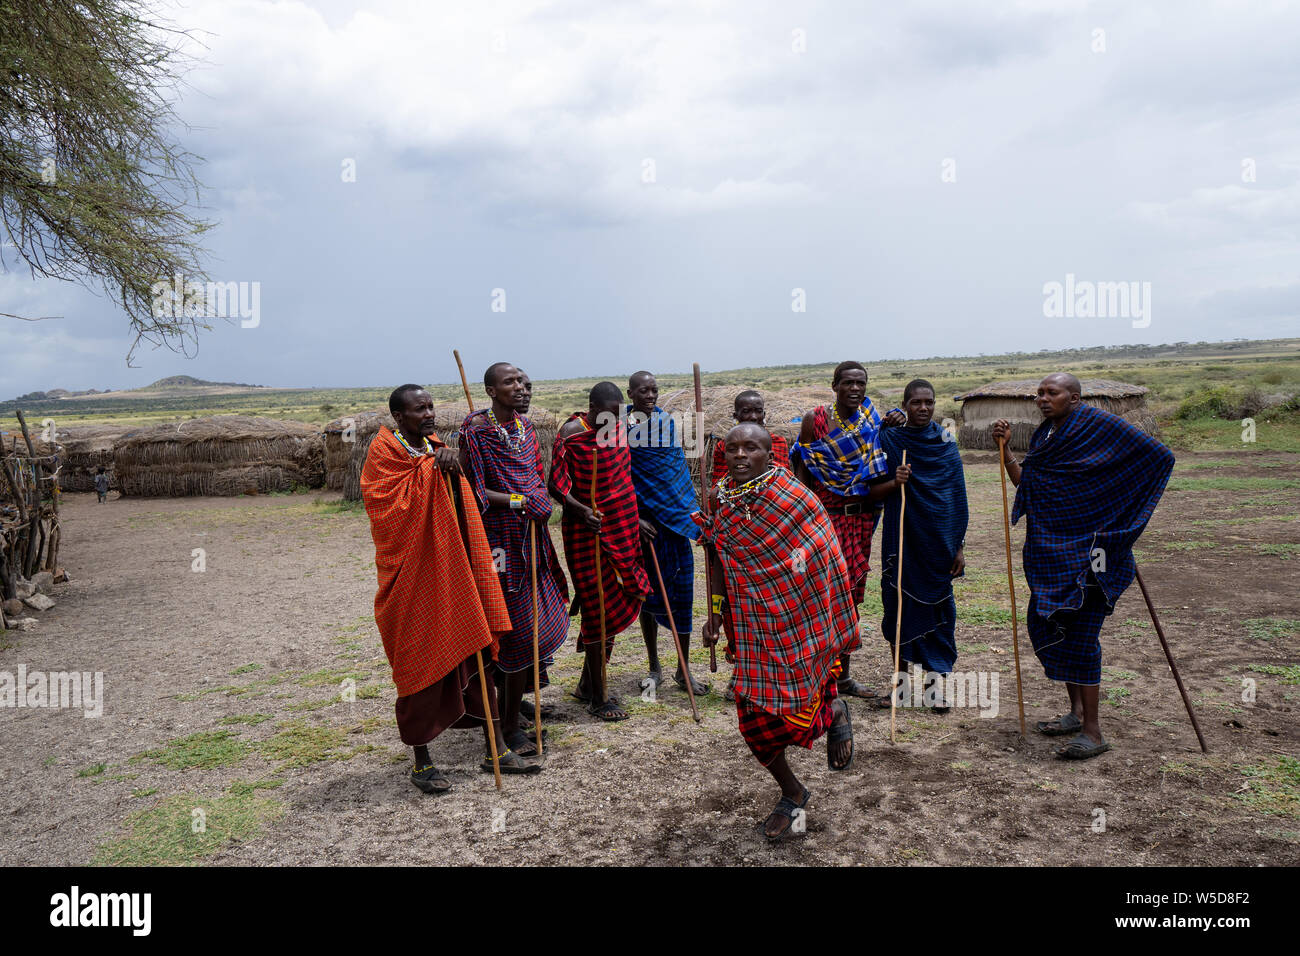 Traditional Masai Jumping Dance at a Masai Village, Tanzania, East Africa Stock Photo